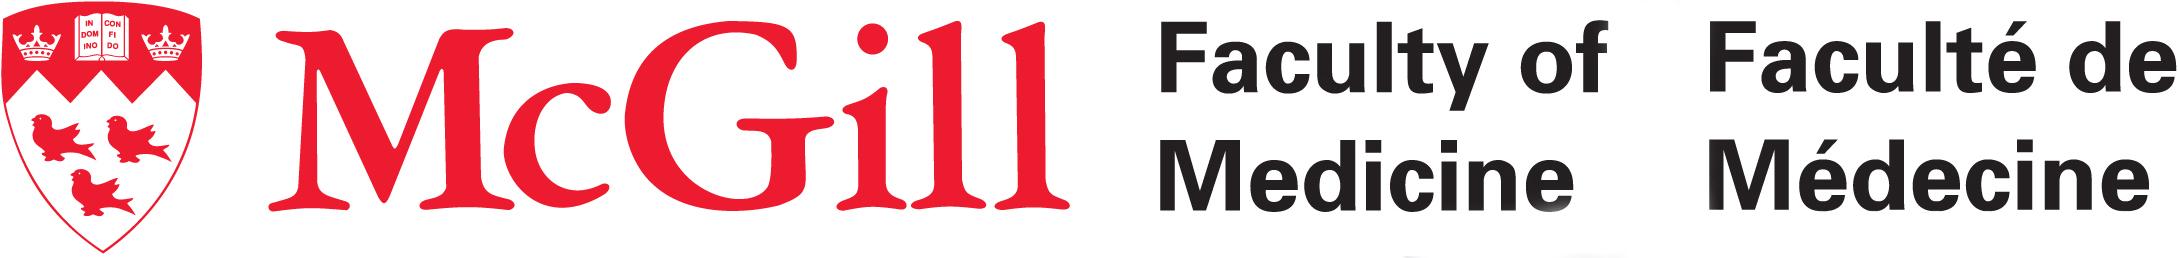 McGill-Medicine-logo-Bilingual4